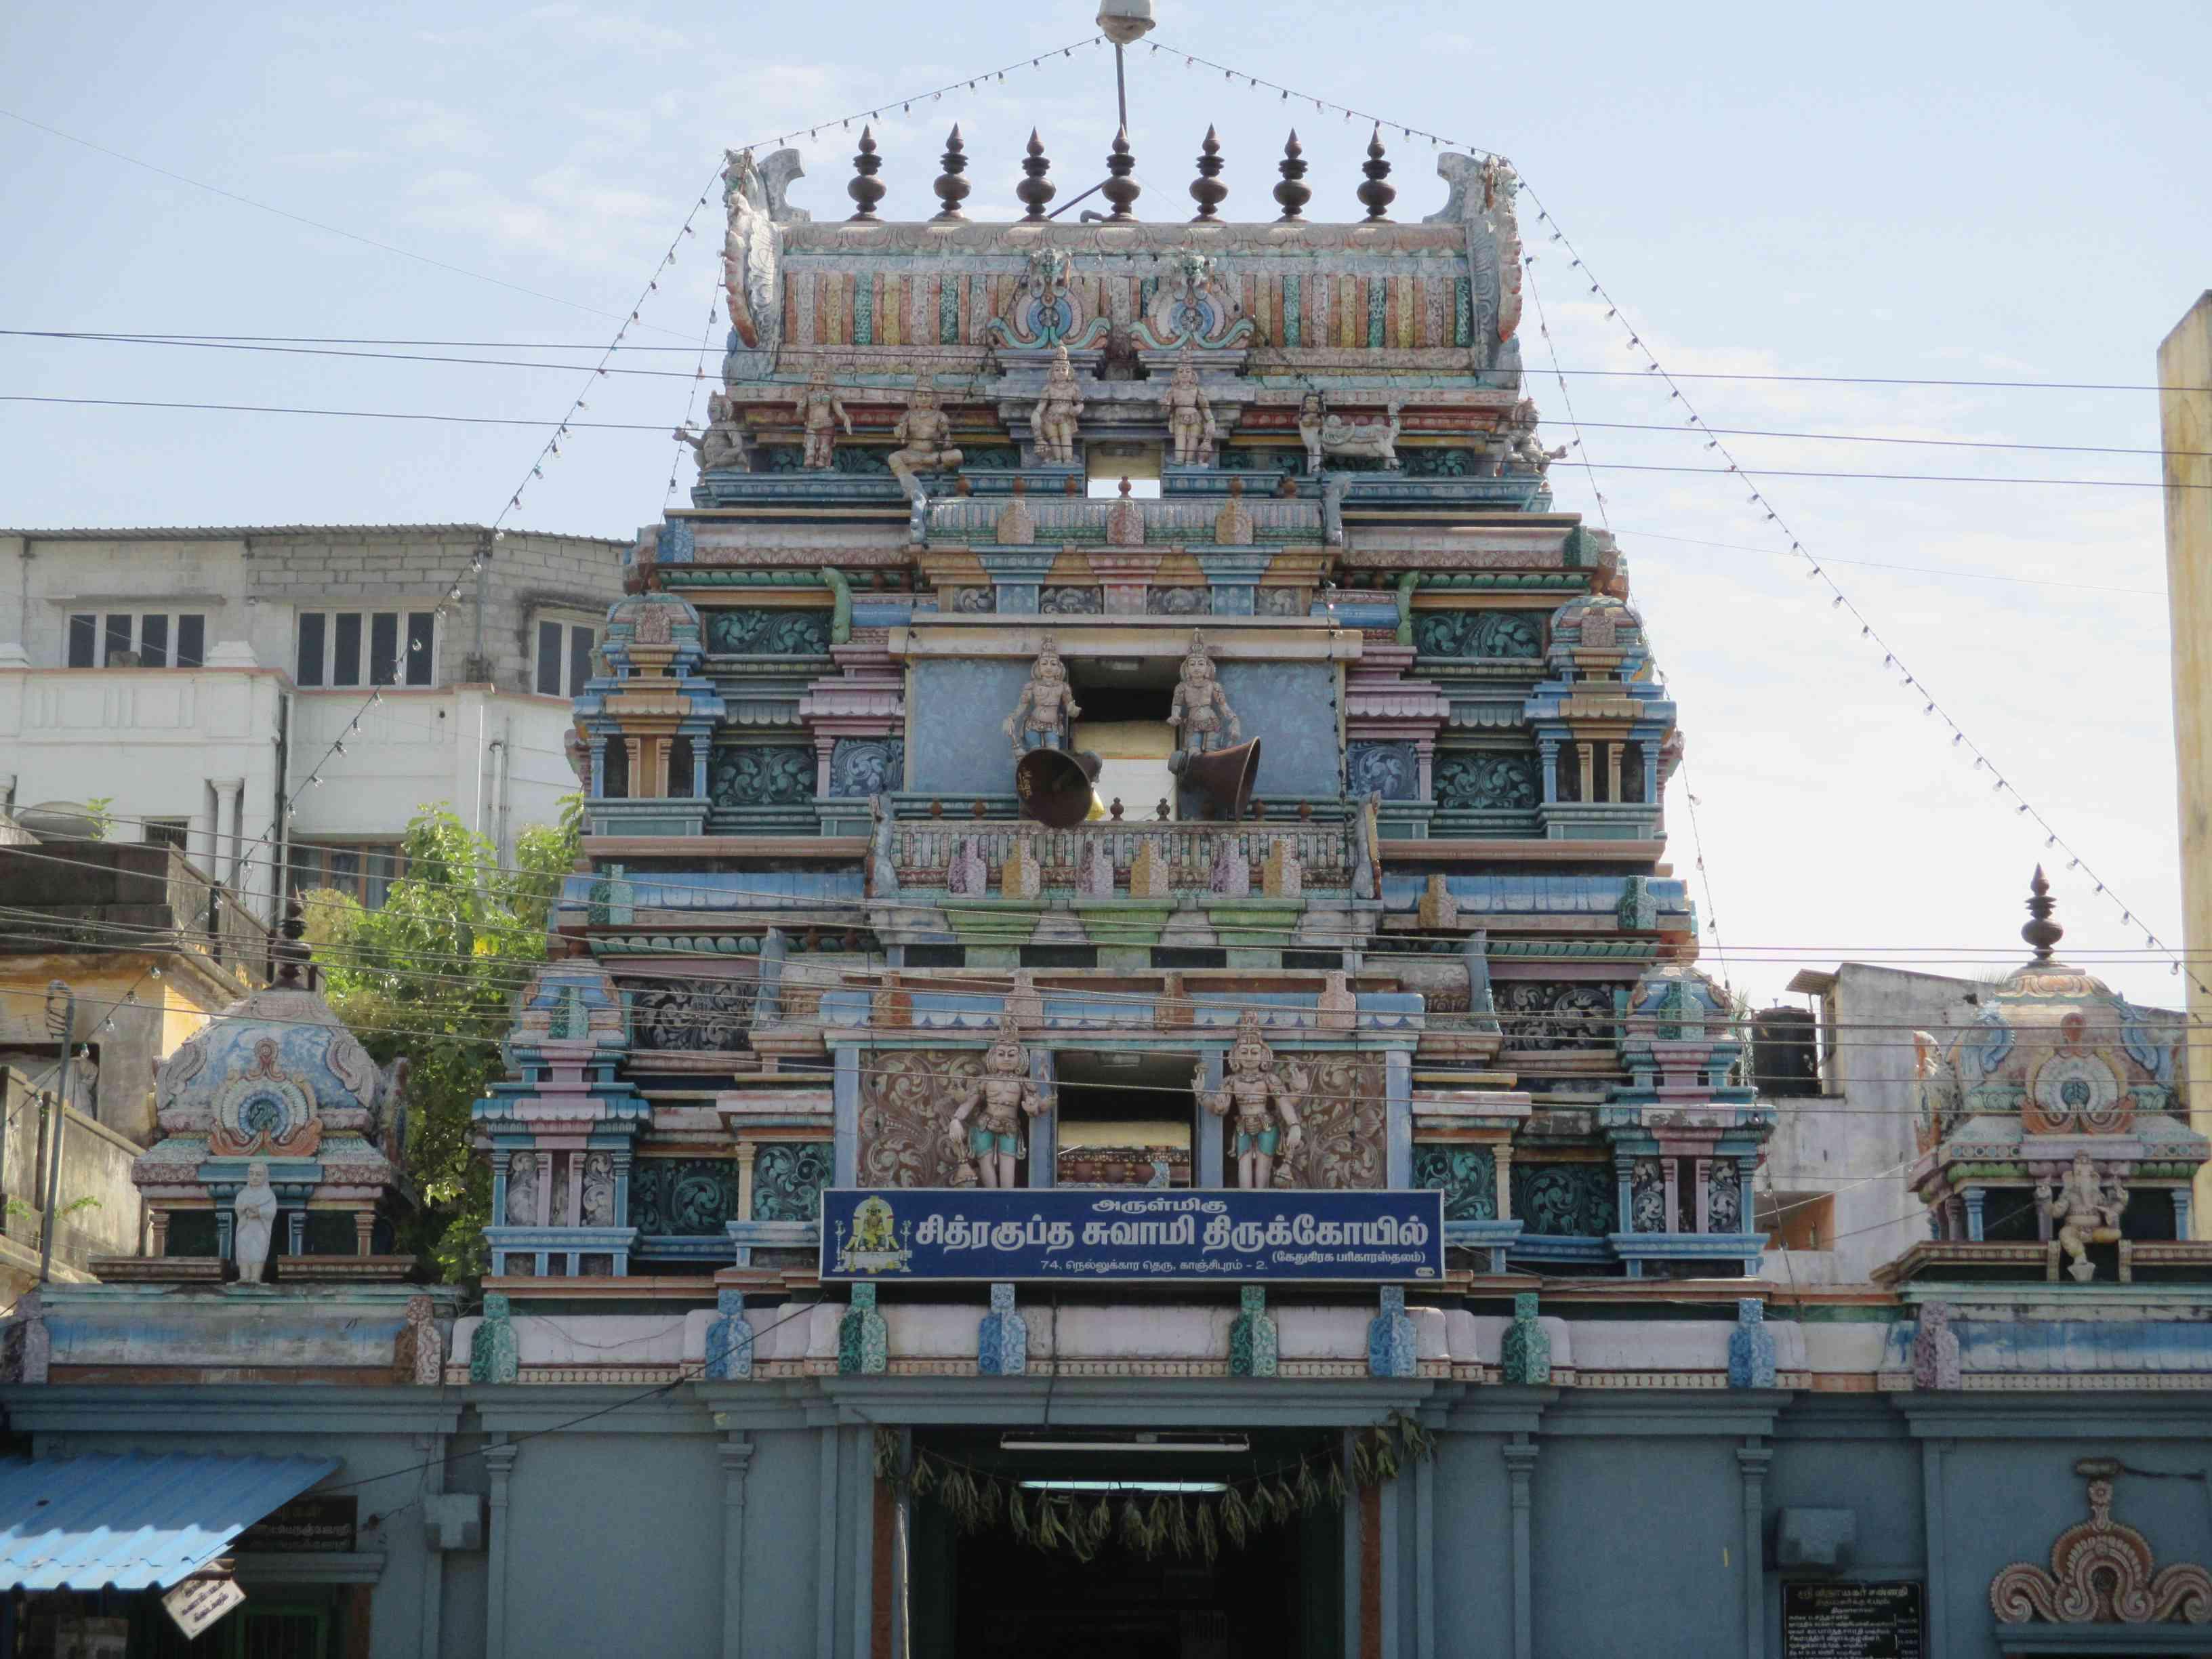 Four-level Chola temple in Kanchipuram, Tamil Nadu, India